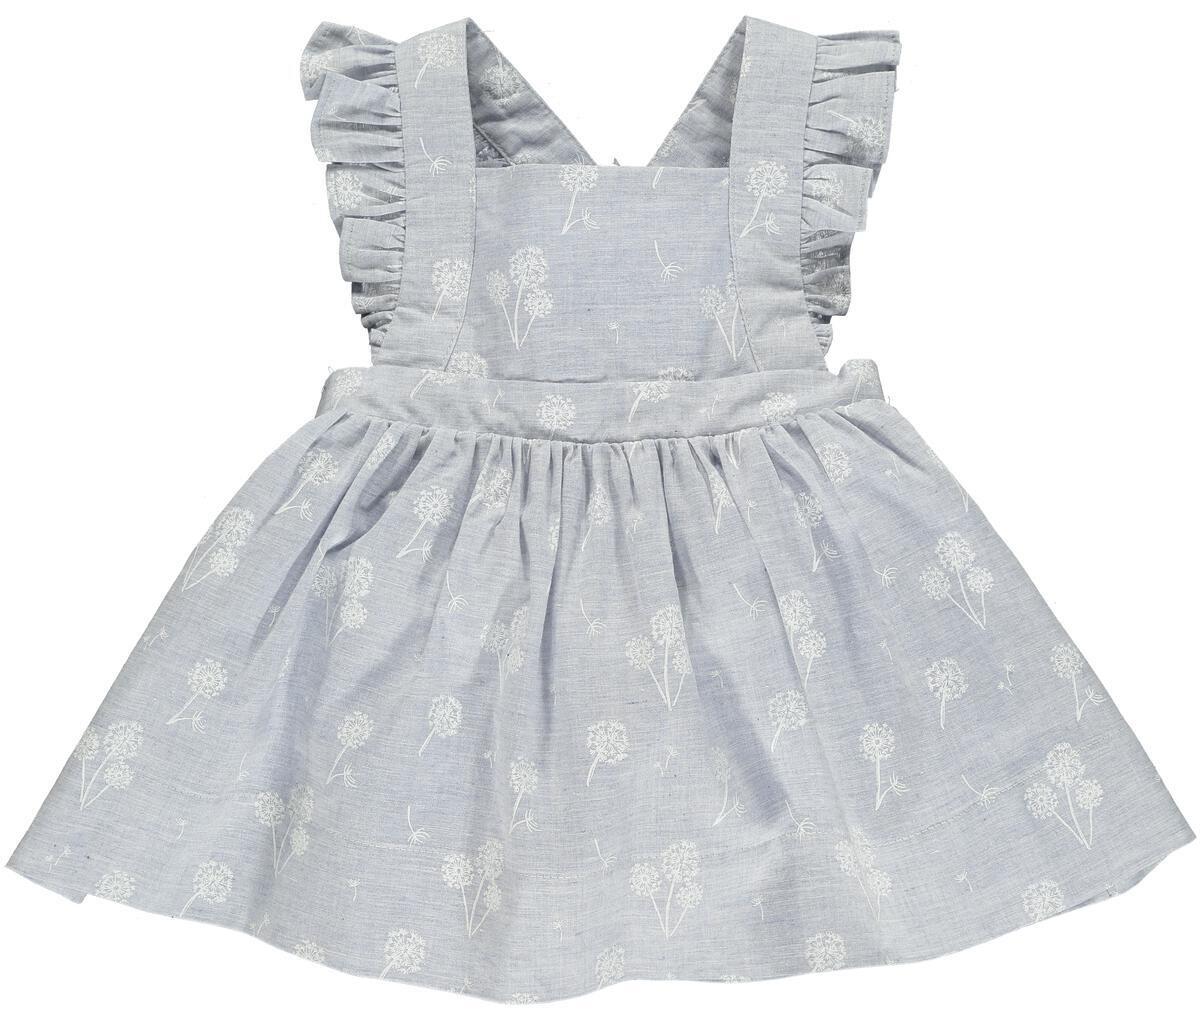 Maeve Dress-Blue Dandelion